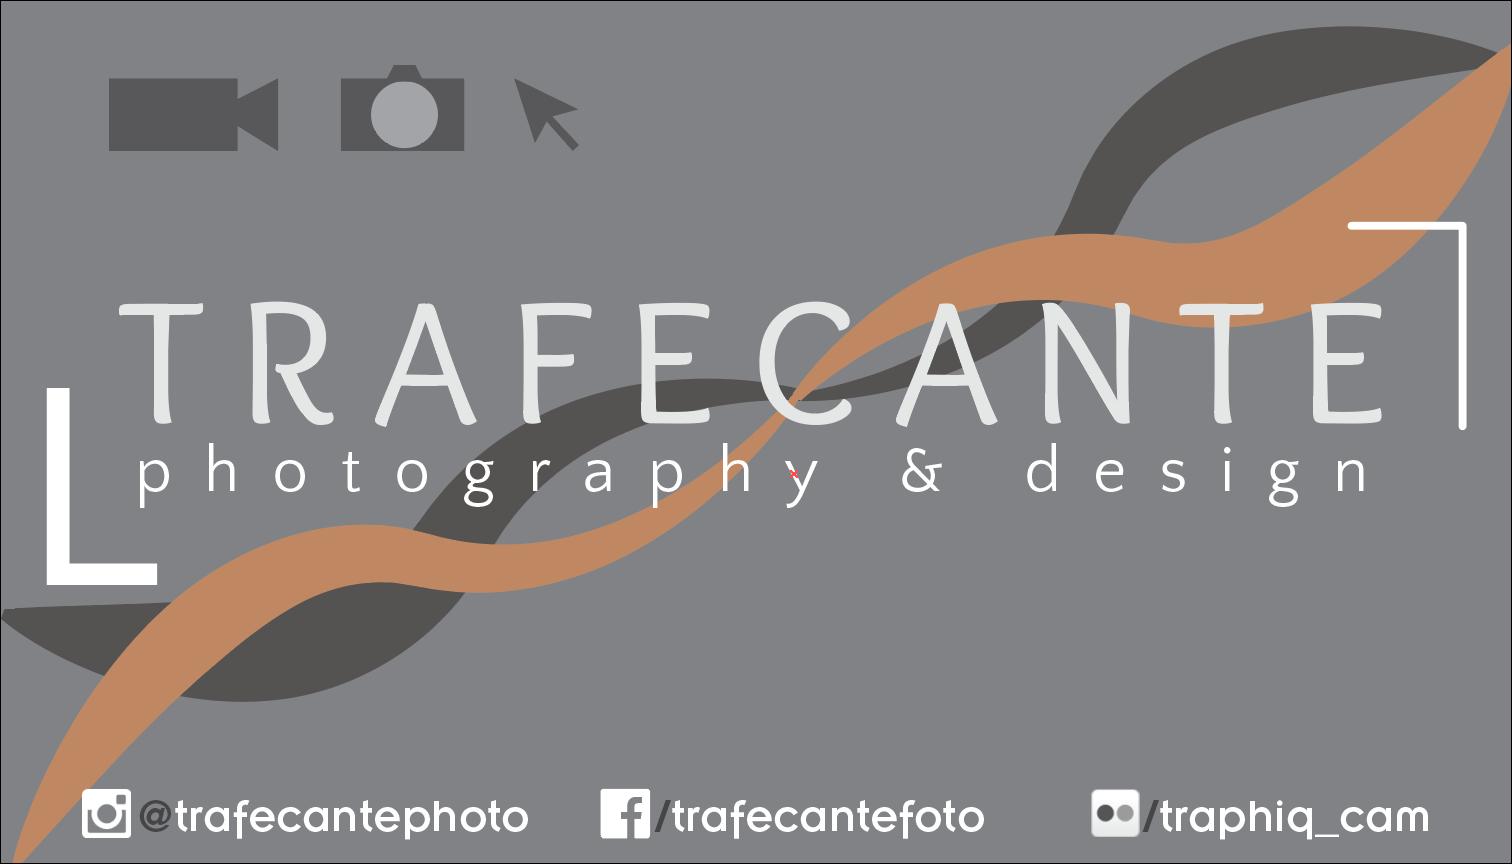 Jimmy Trafecante-Lamboy card designs on Behance